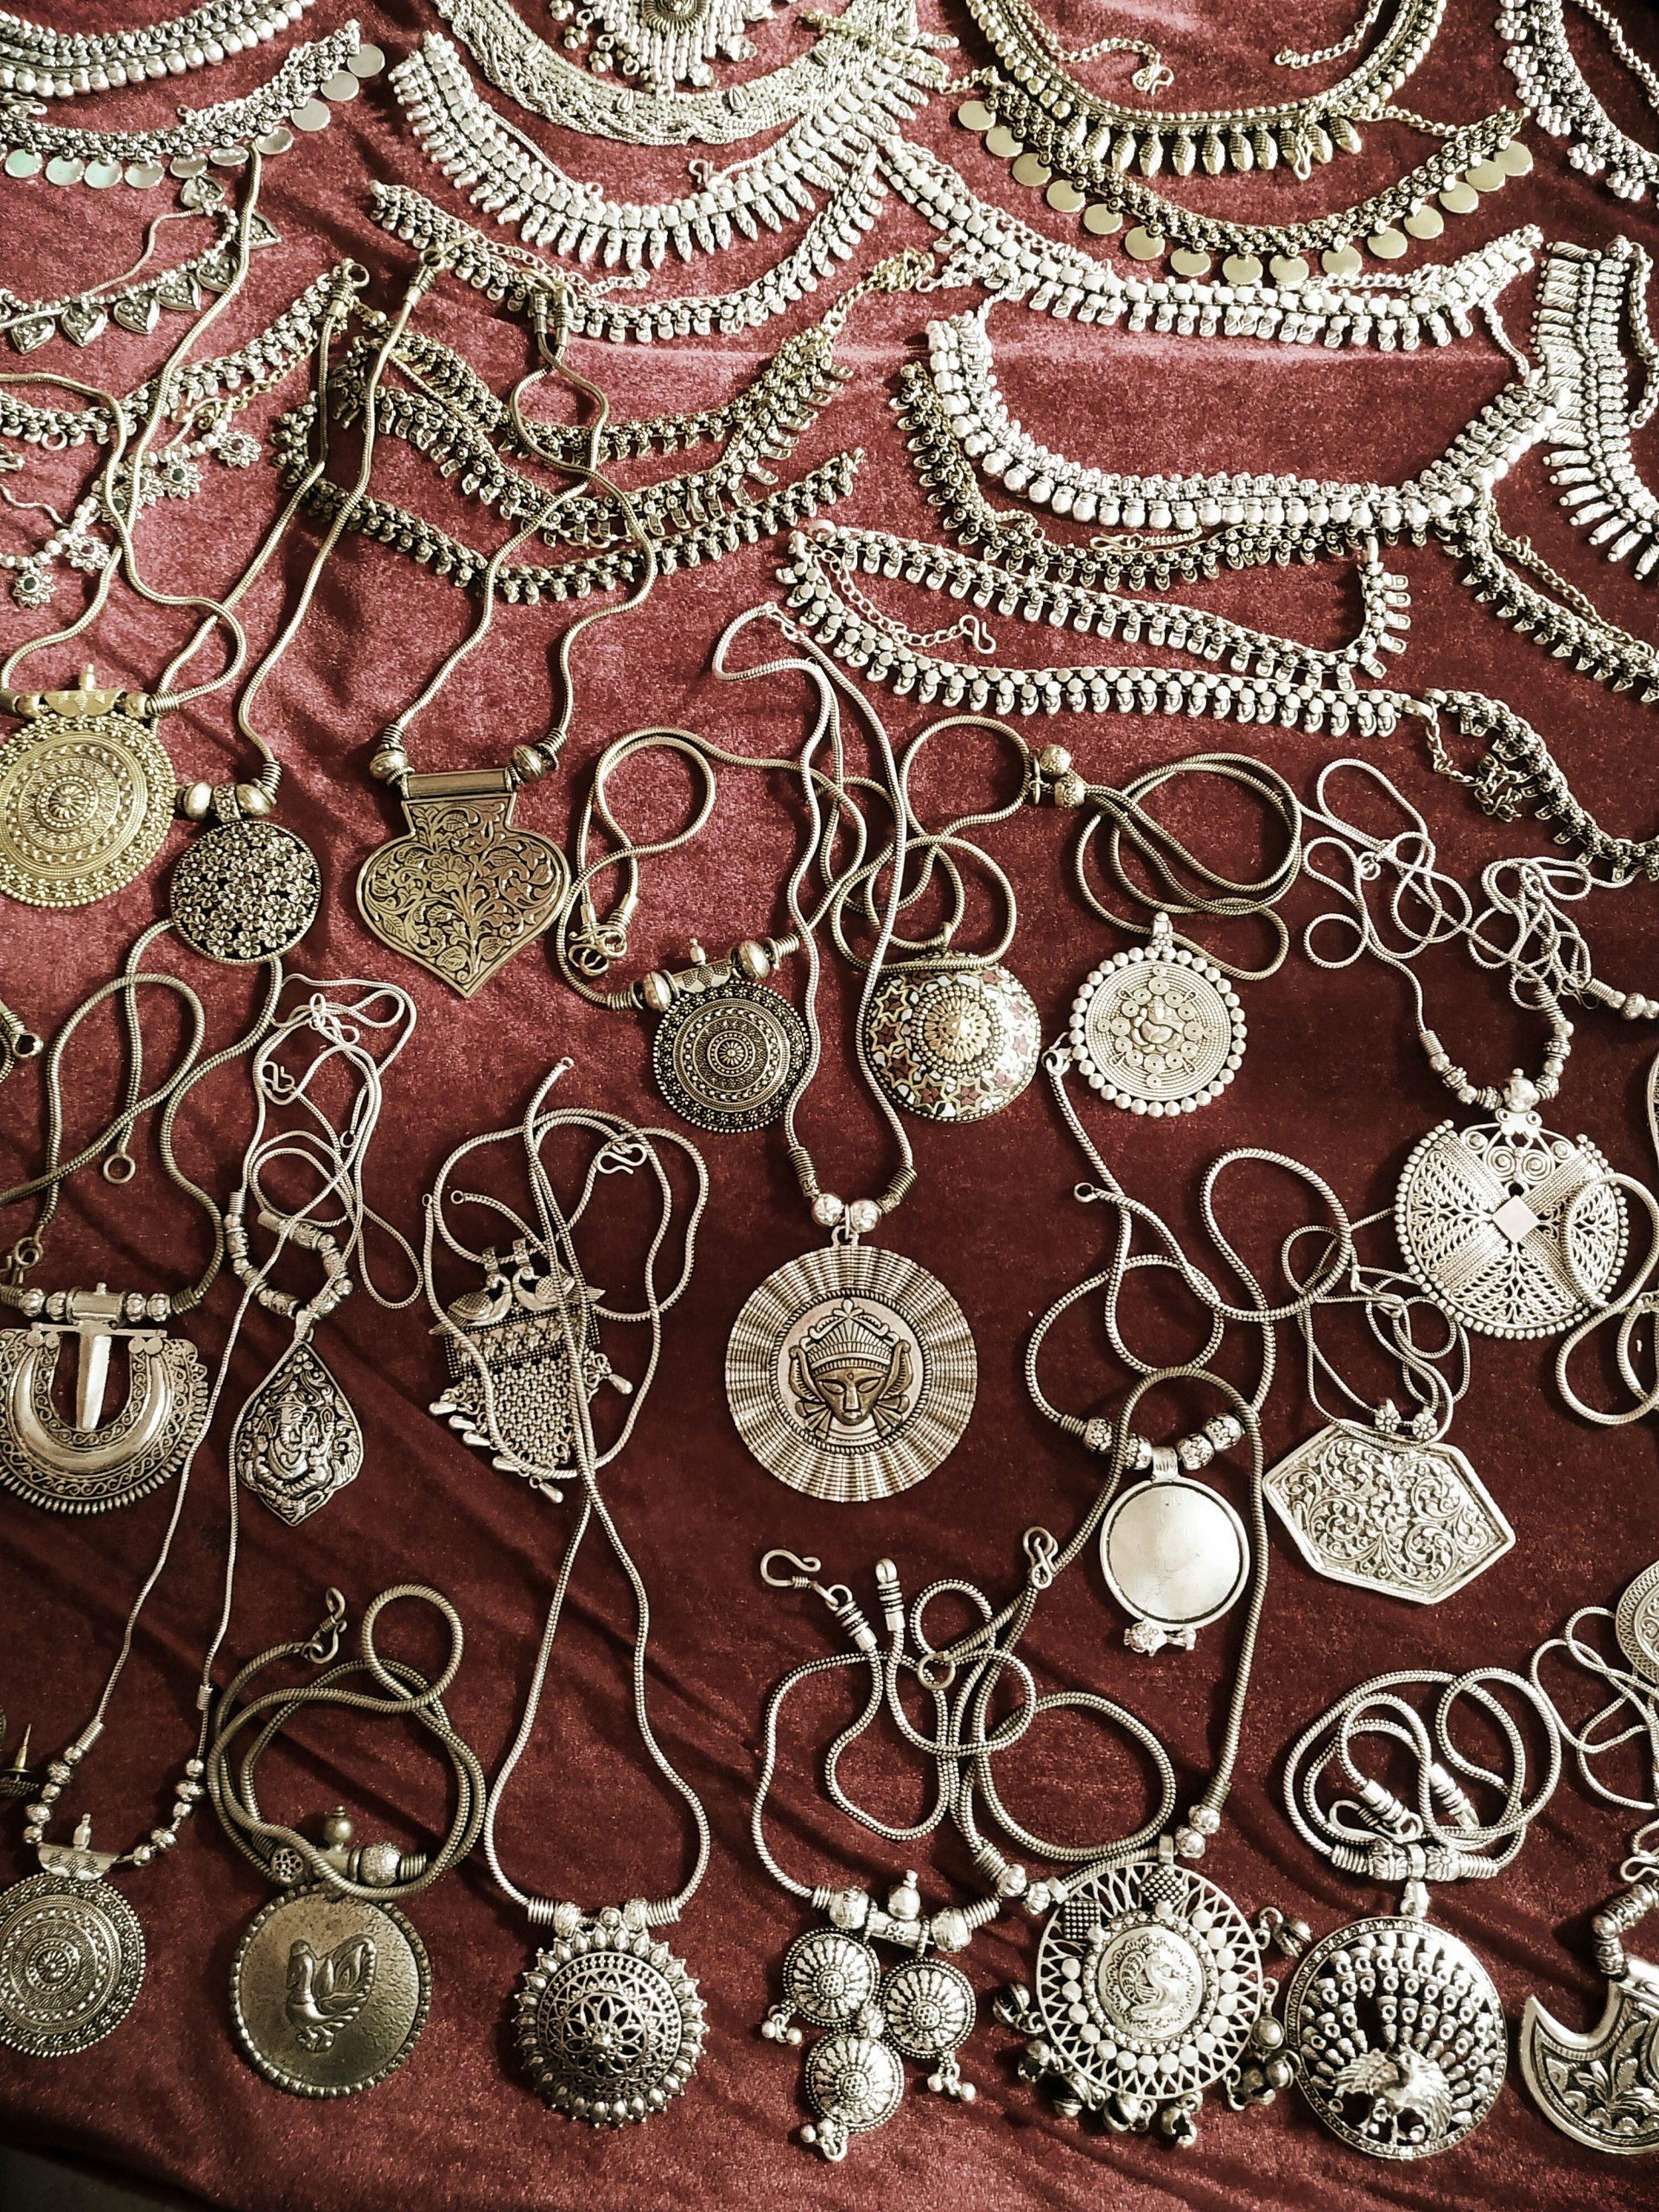 law graden night market-antique jewellery shopping in ahmedabad